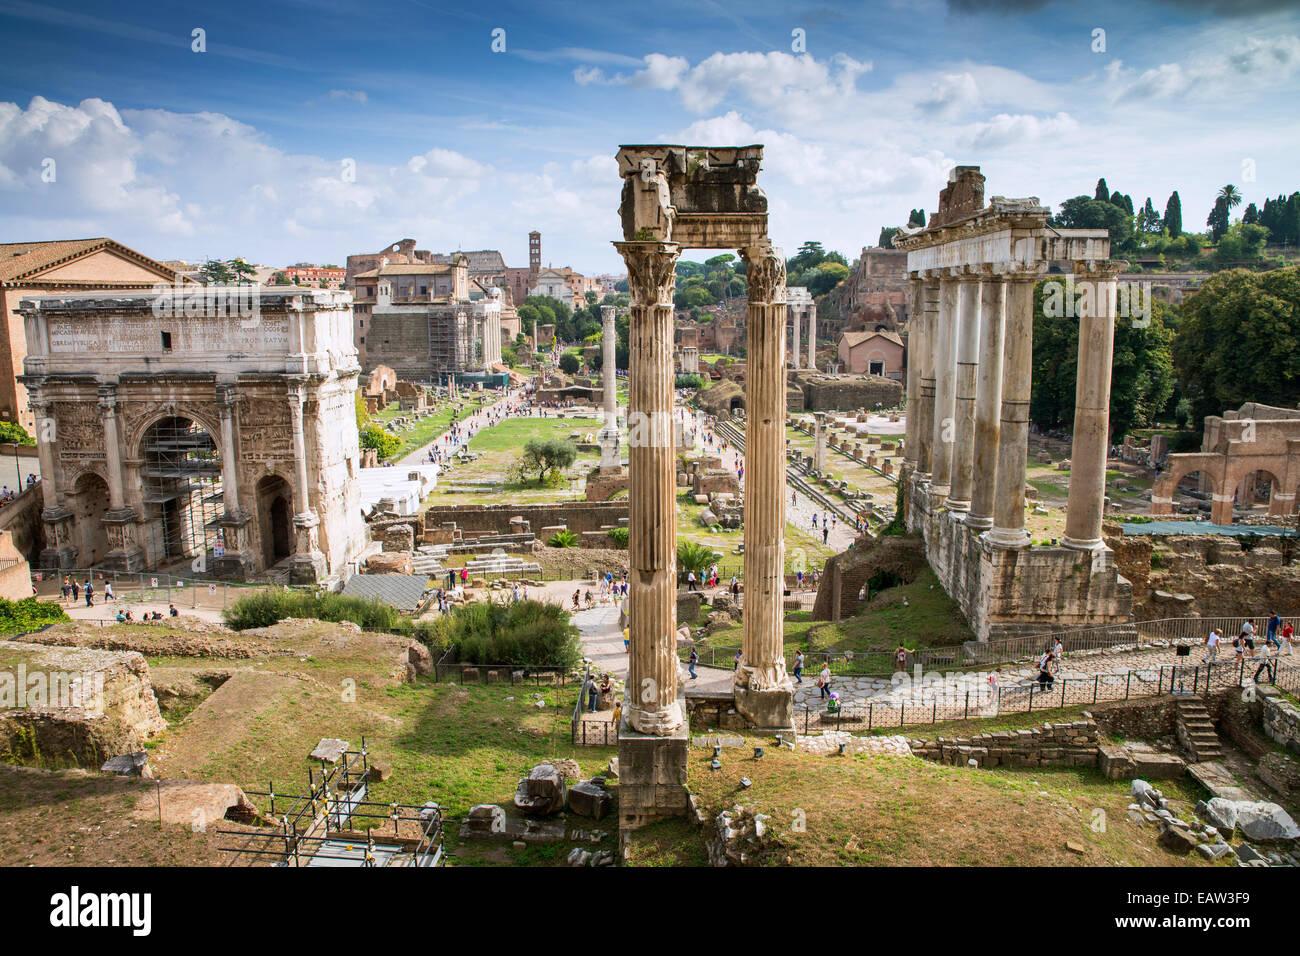 El Foro Romano (Forum Romanum), Roma, Lazio, Italia, Europa Imagen De Stock